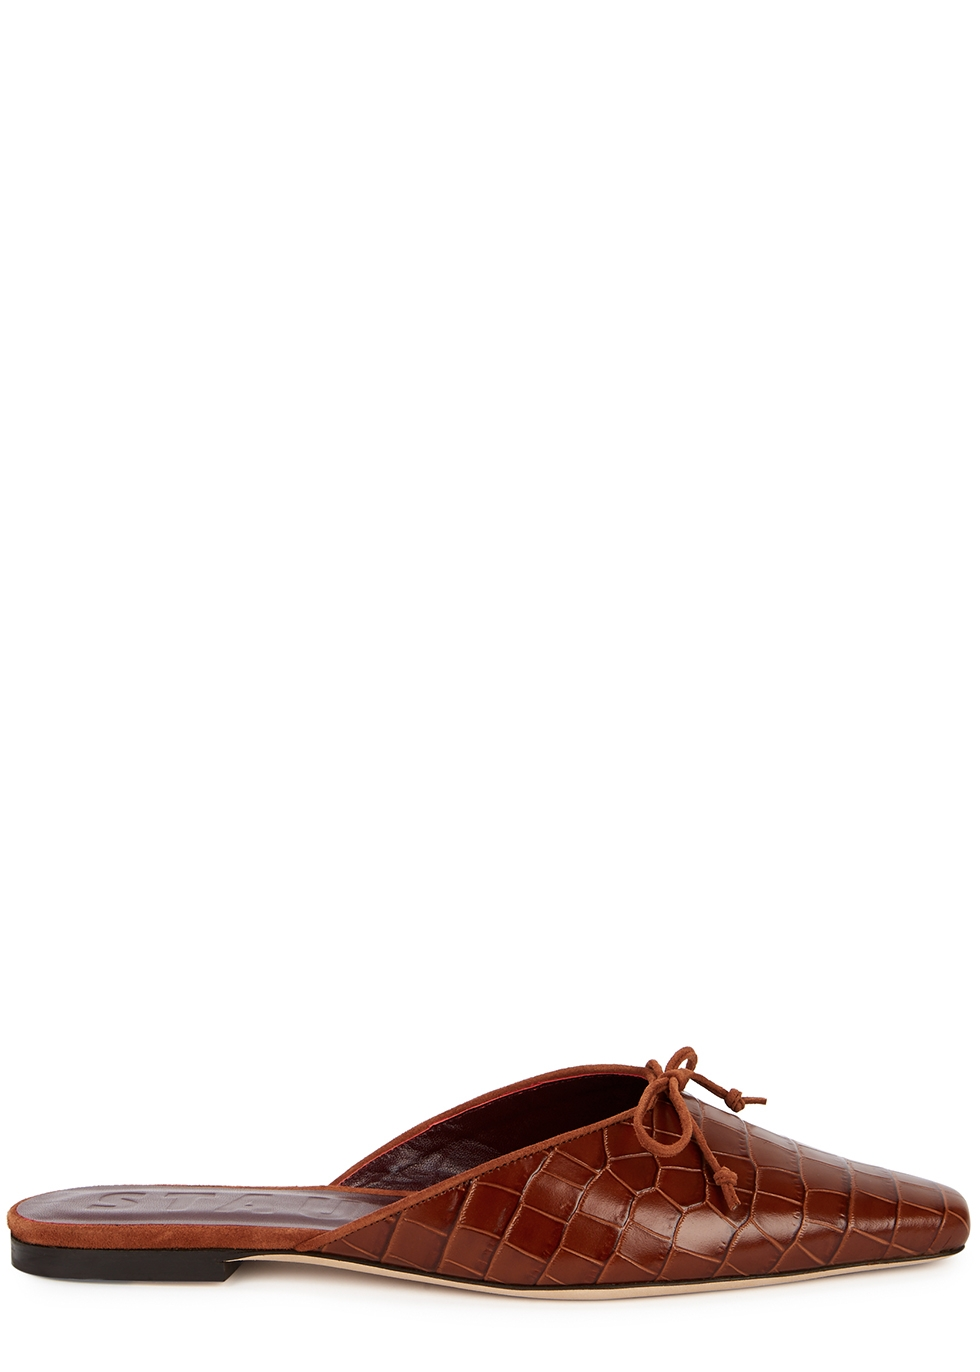 Gina brown crocodile-effect leather flats